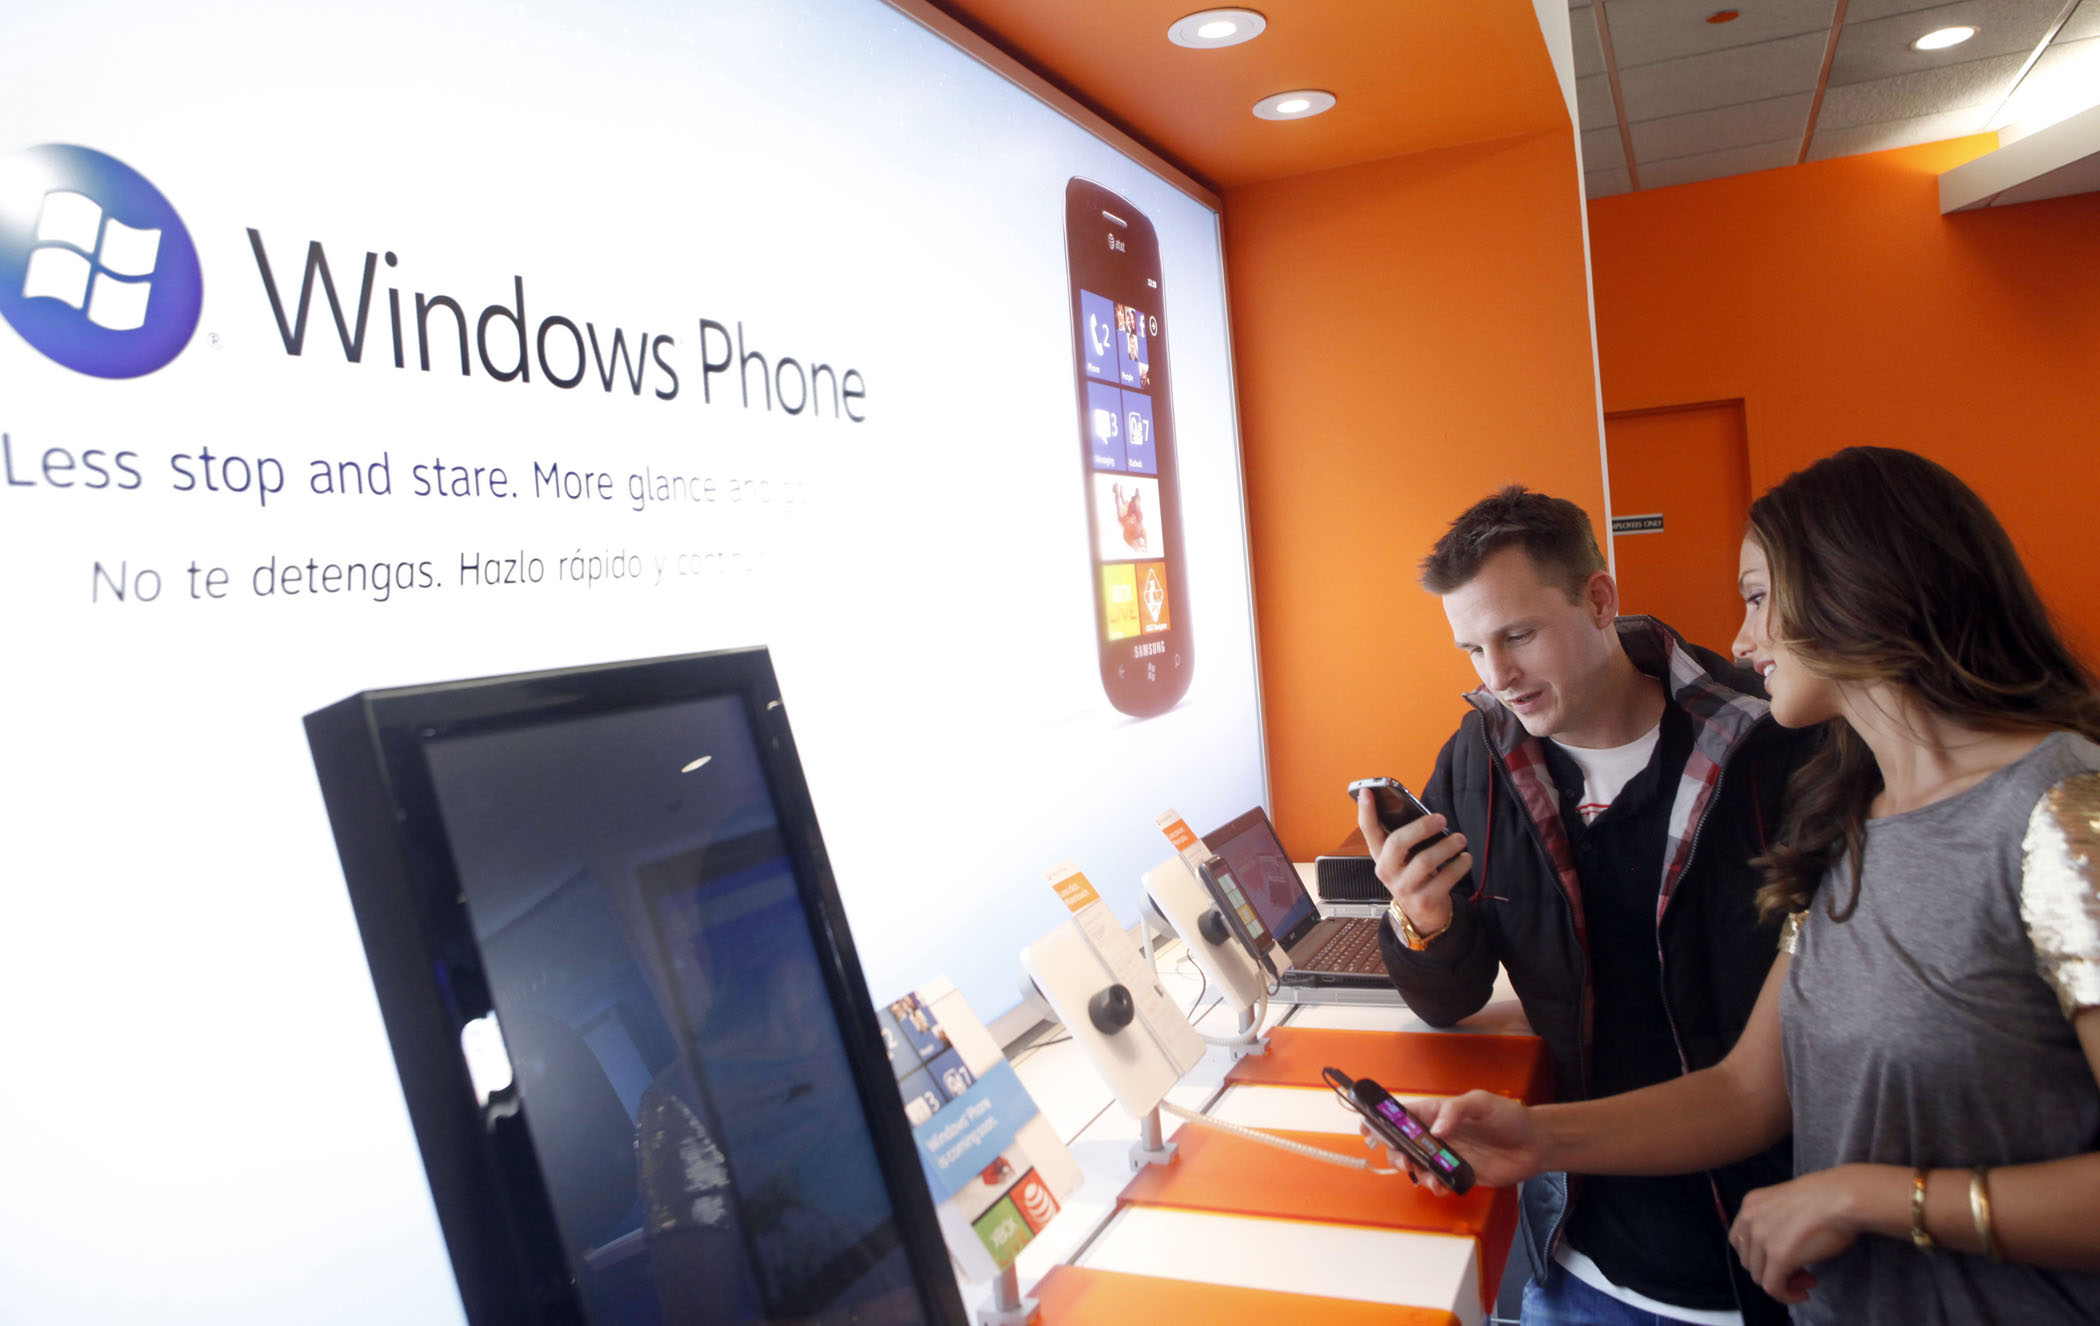 Microsoft Windows Phone 7 Launch